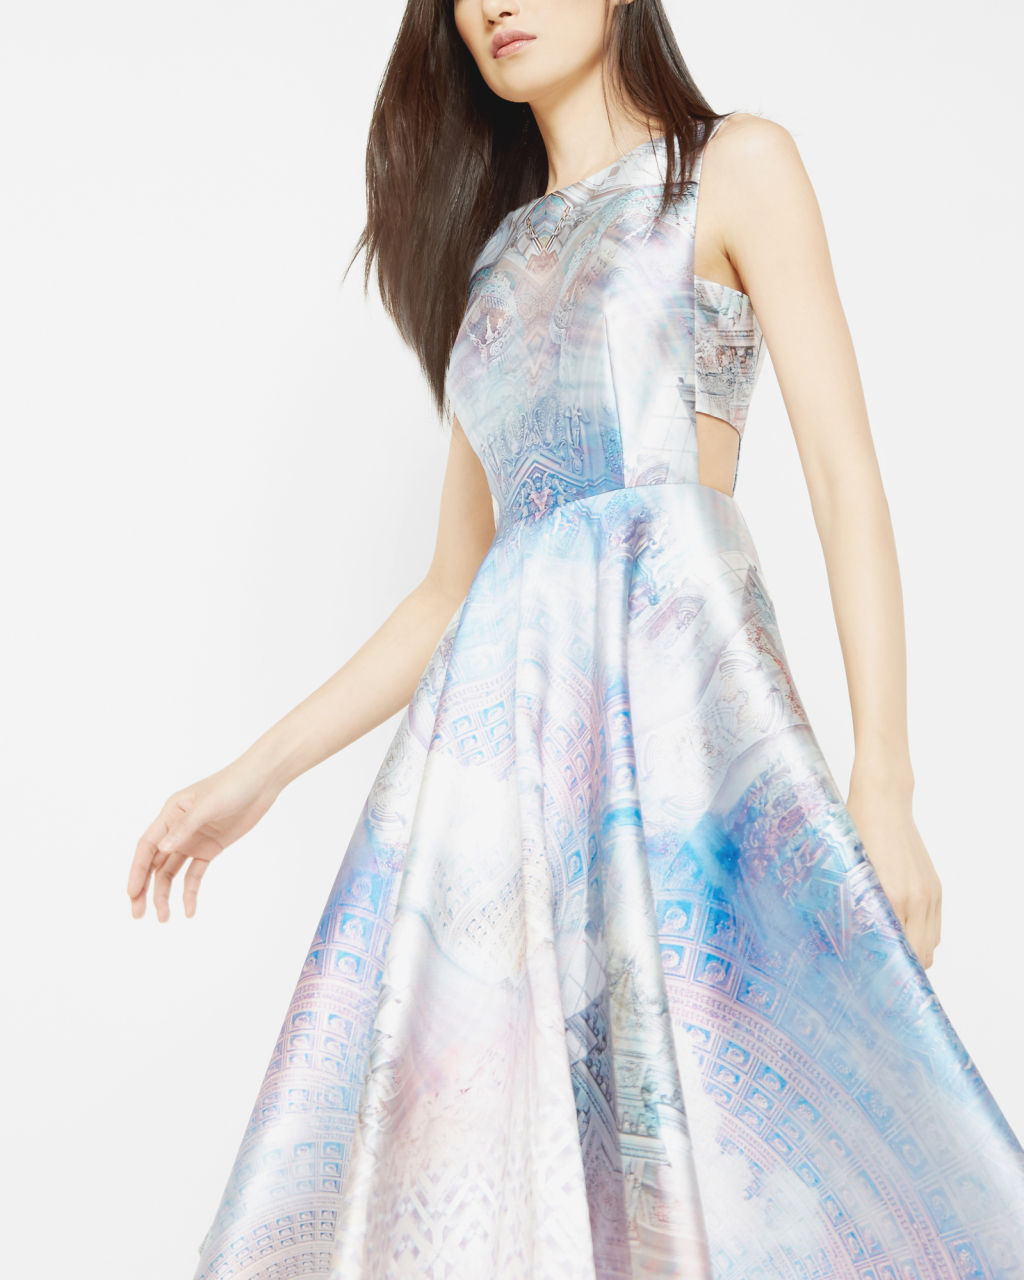 uk-Womens-Clothing-Dresses-LARIN-Dreamscape-cut-out-midi-dress-Lilac-WS6W_LARIN_69-LILAC_1.jpg.jpg